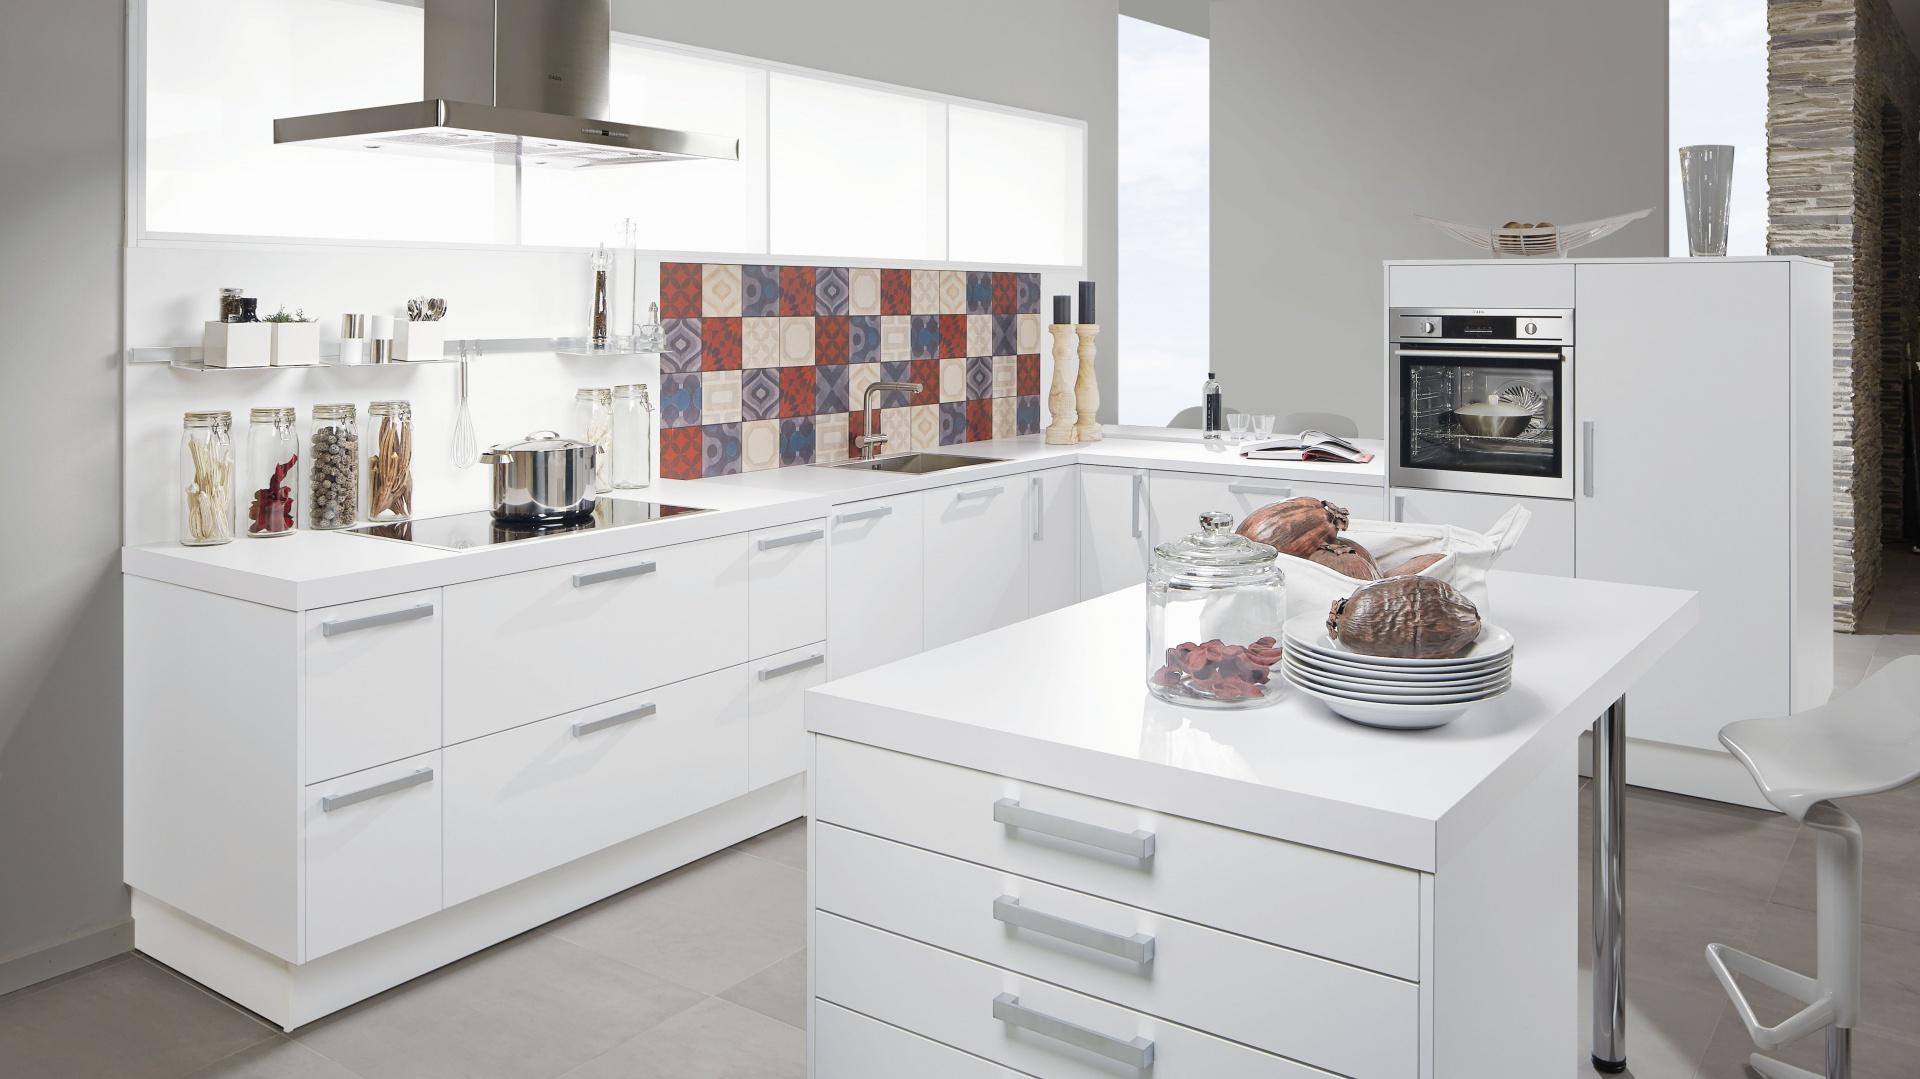 Fronty mebli kuchennych Modna biała kuchnia 20   -> Kuchnie Z Uchwytami